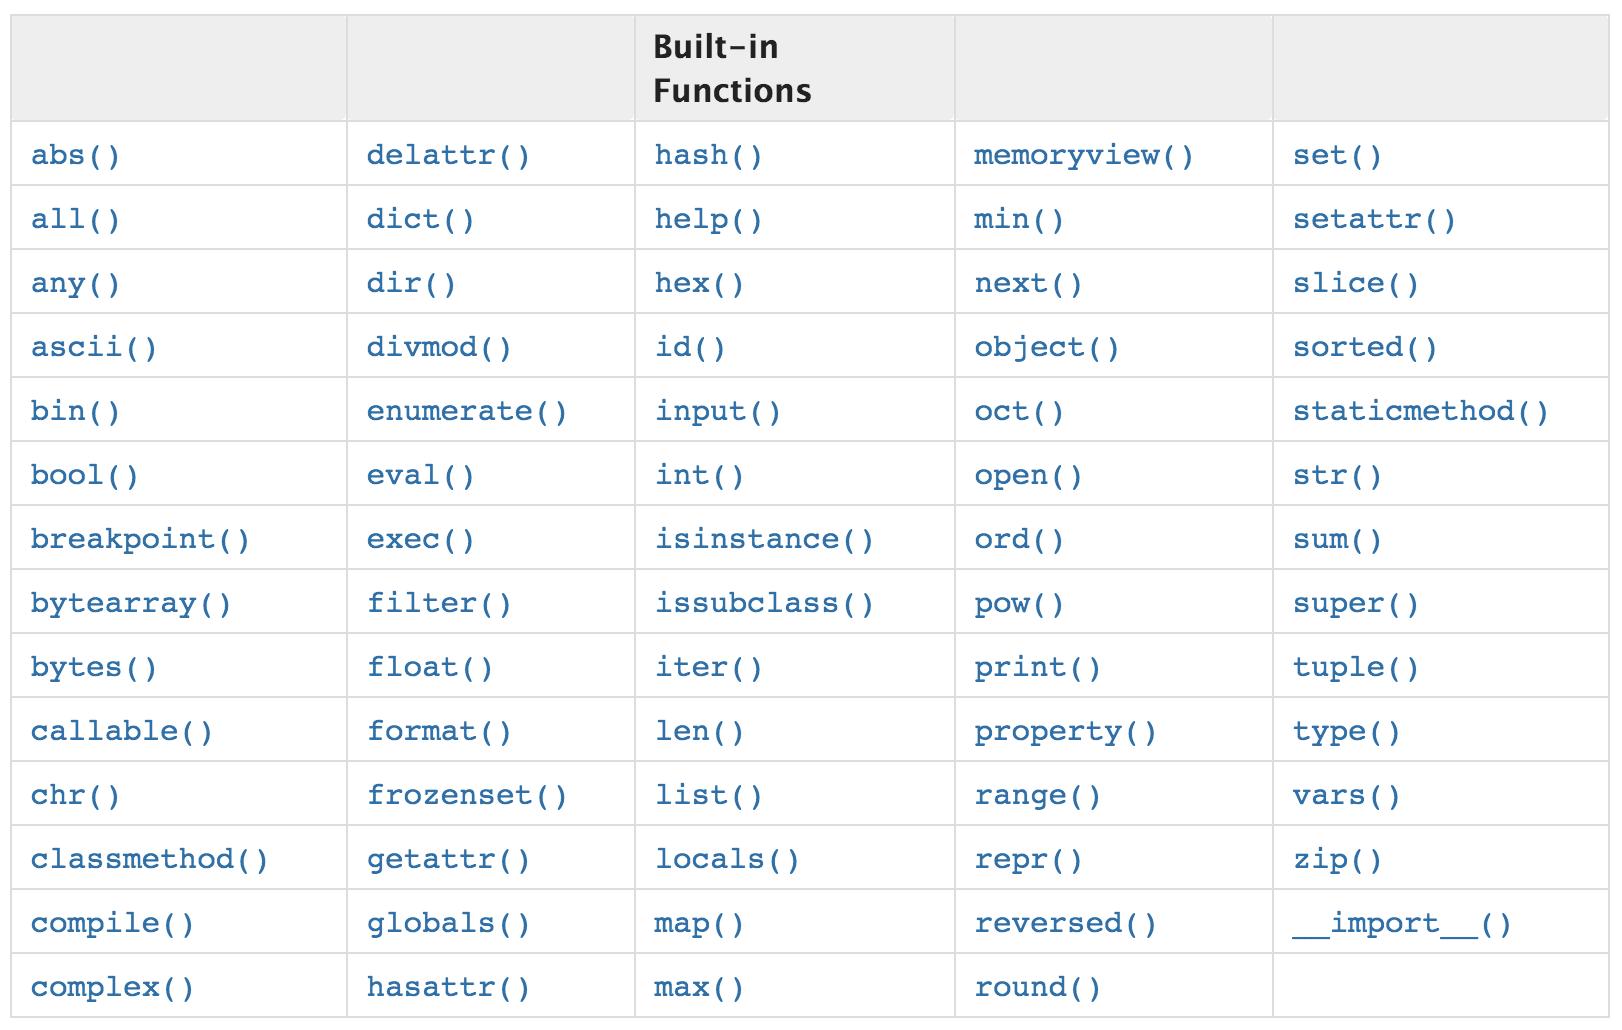 "<a href=""https://docs.python.org/3/library/functions.html"" target=""_blank"" rel=""noopener noreferrer nofollow"">Список встроенных функций Python 3</a>"